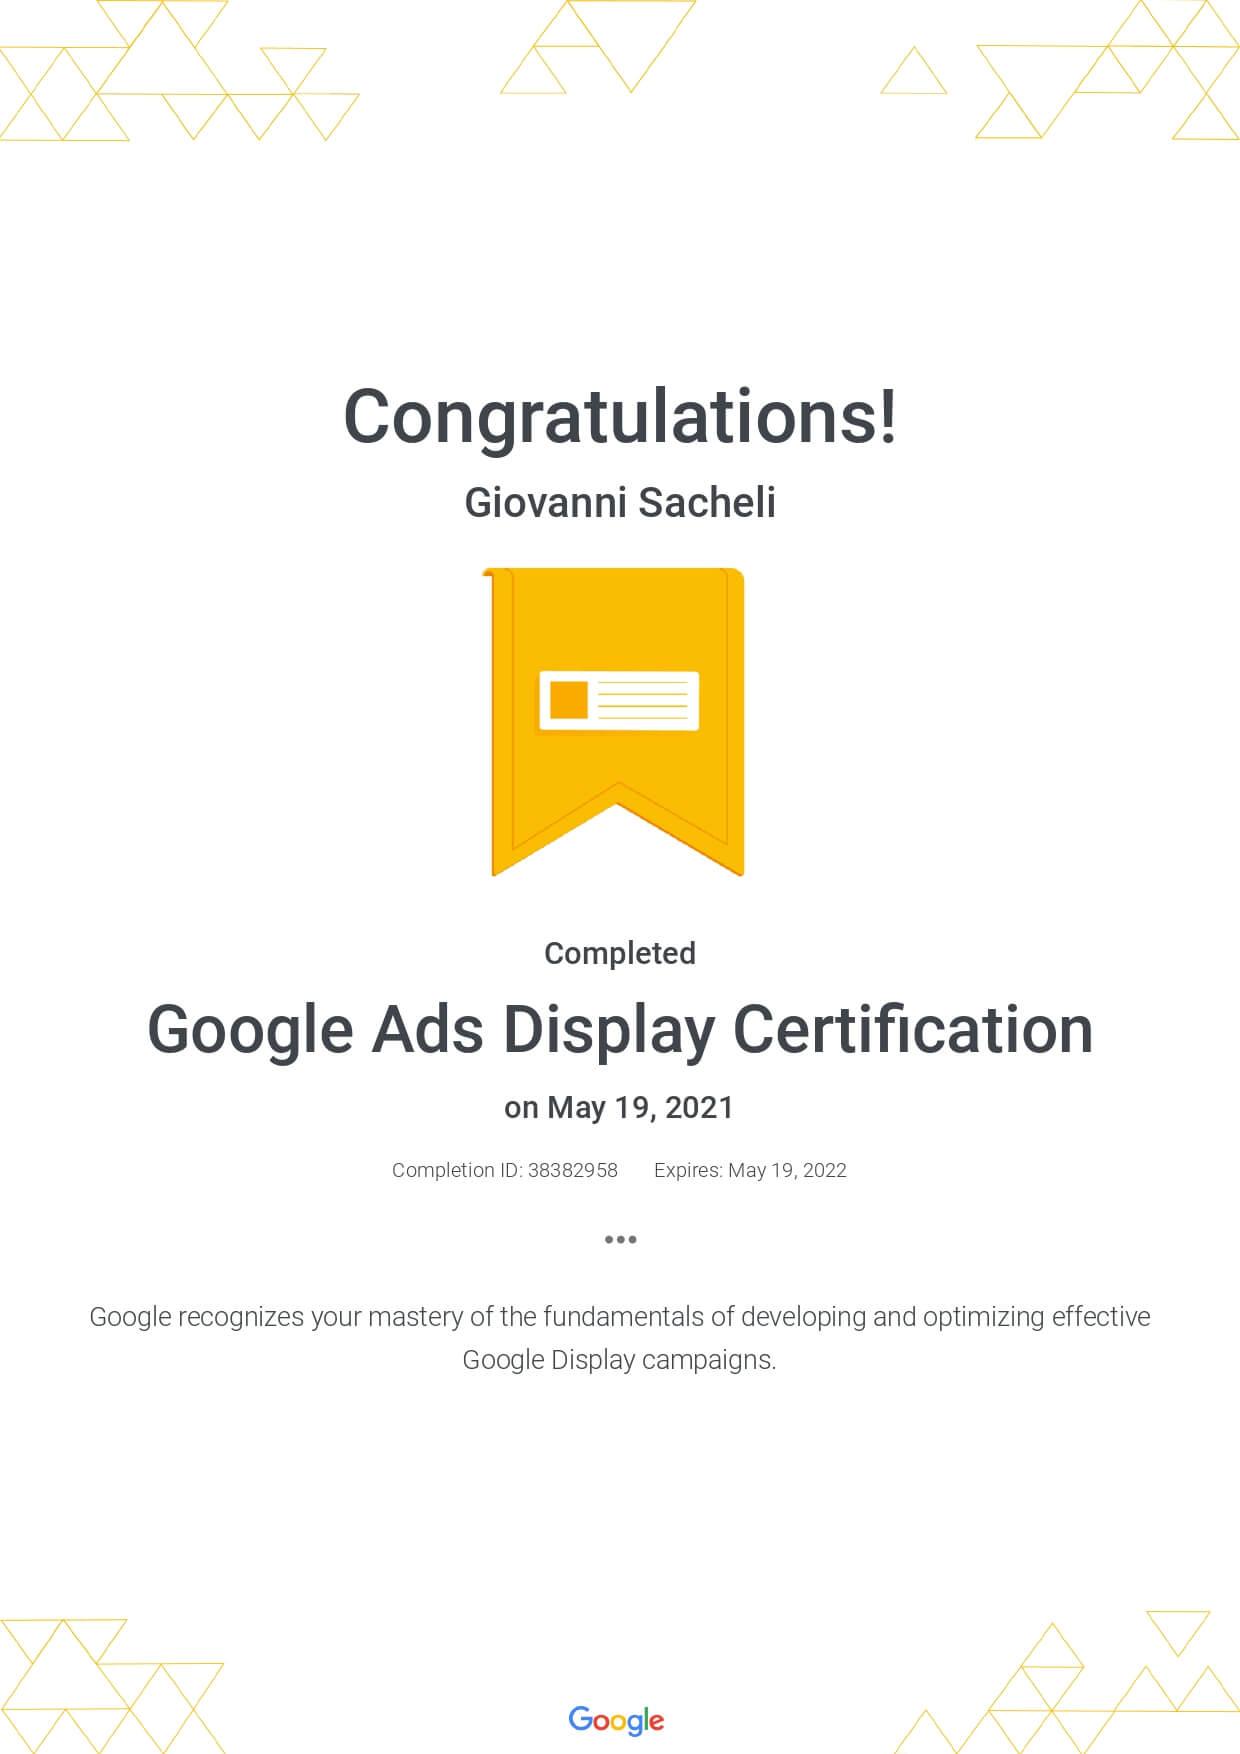 Google Ads Display Certification 2021